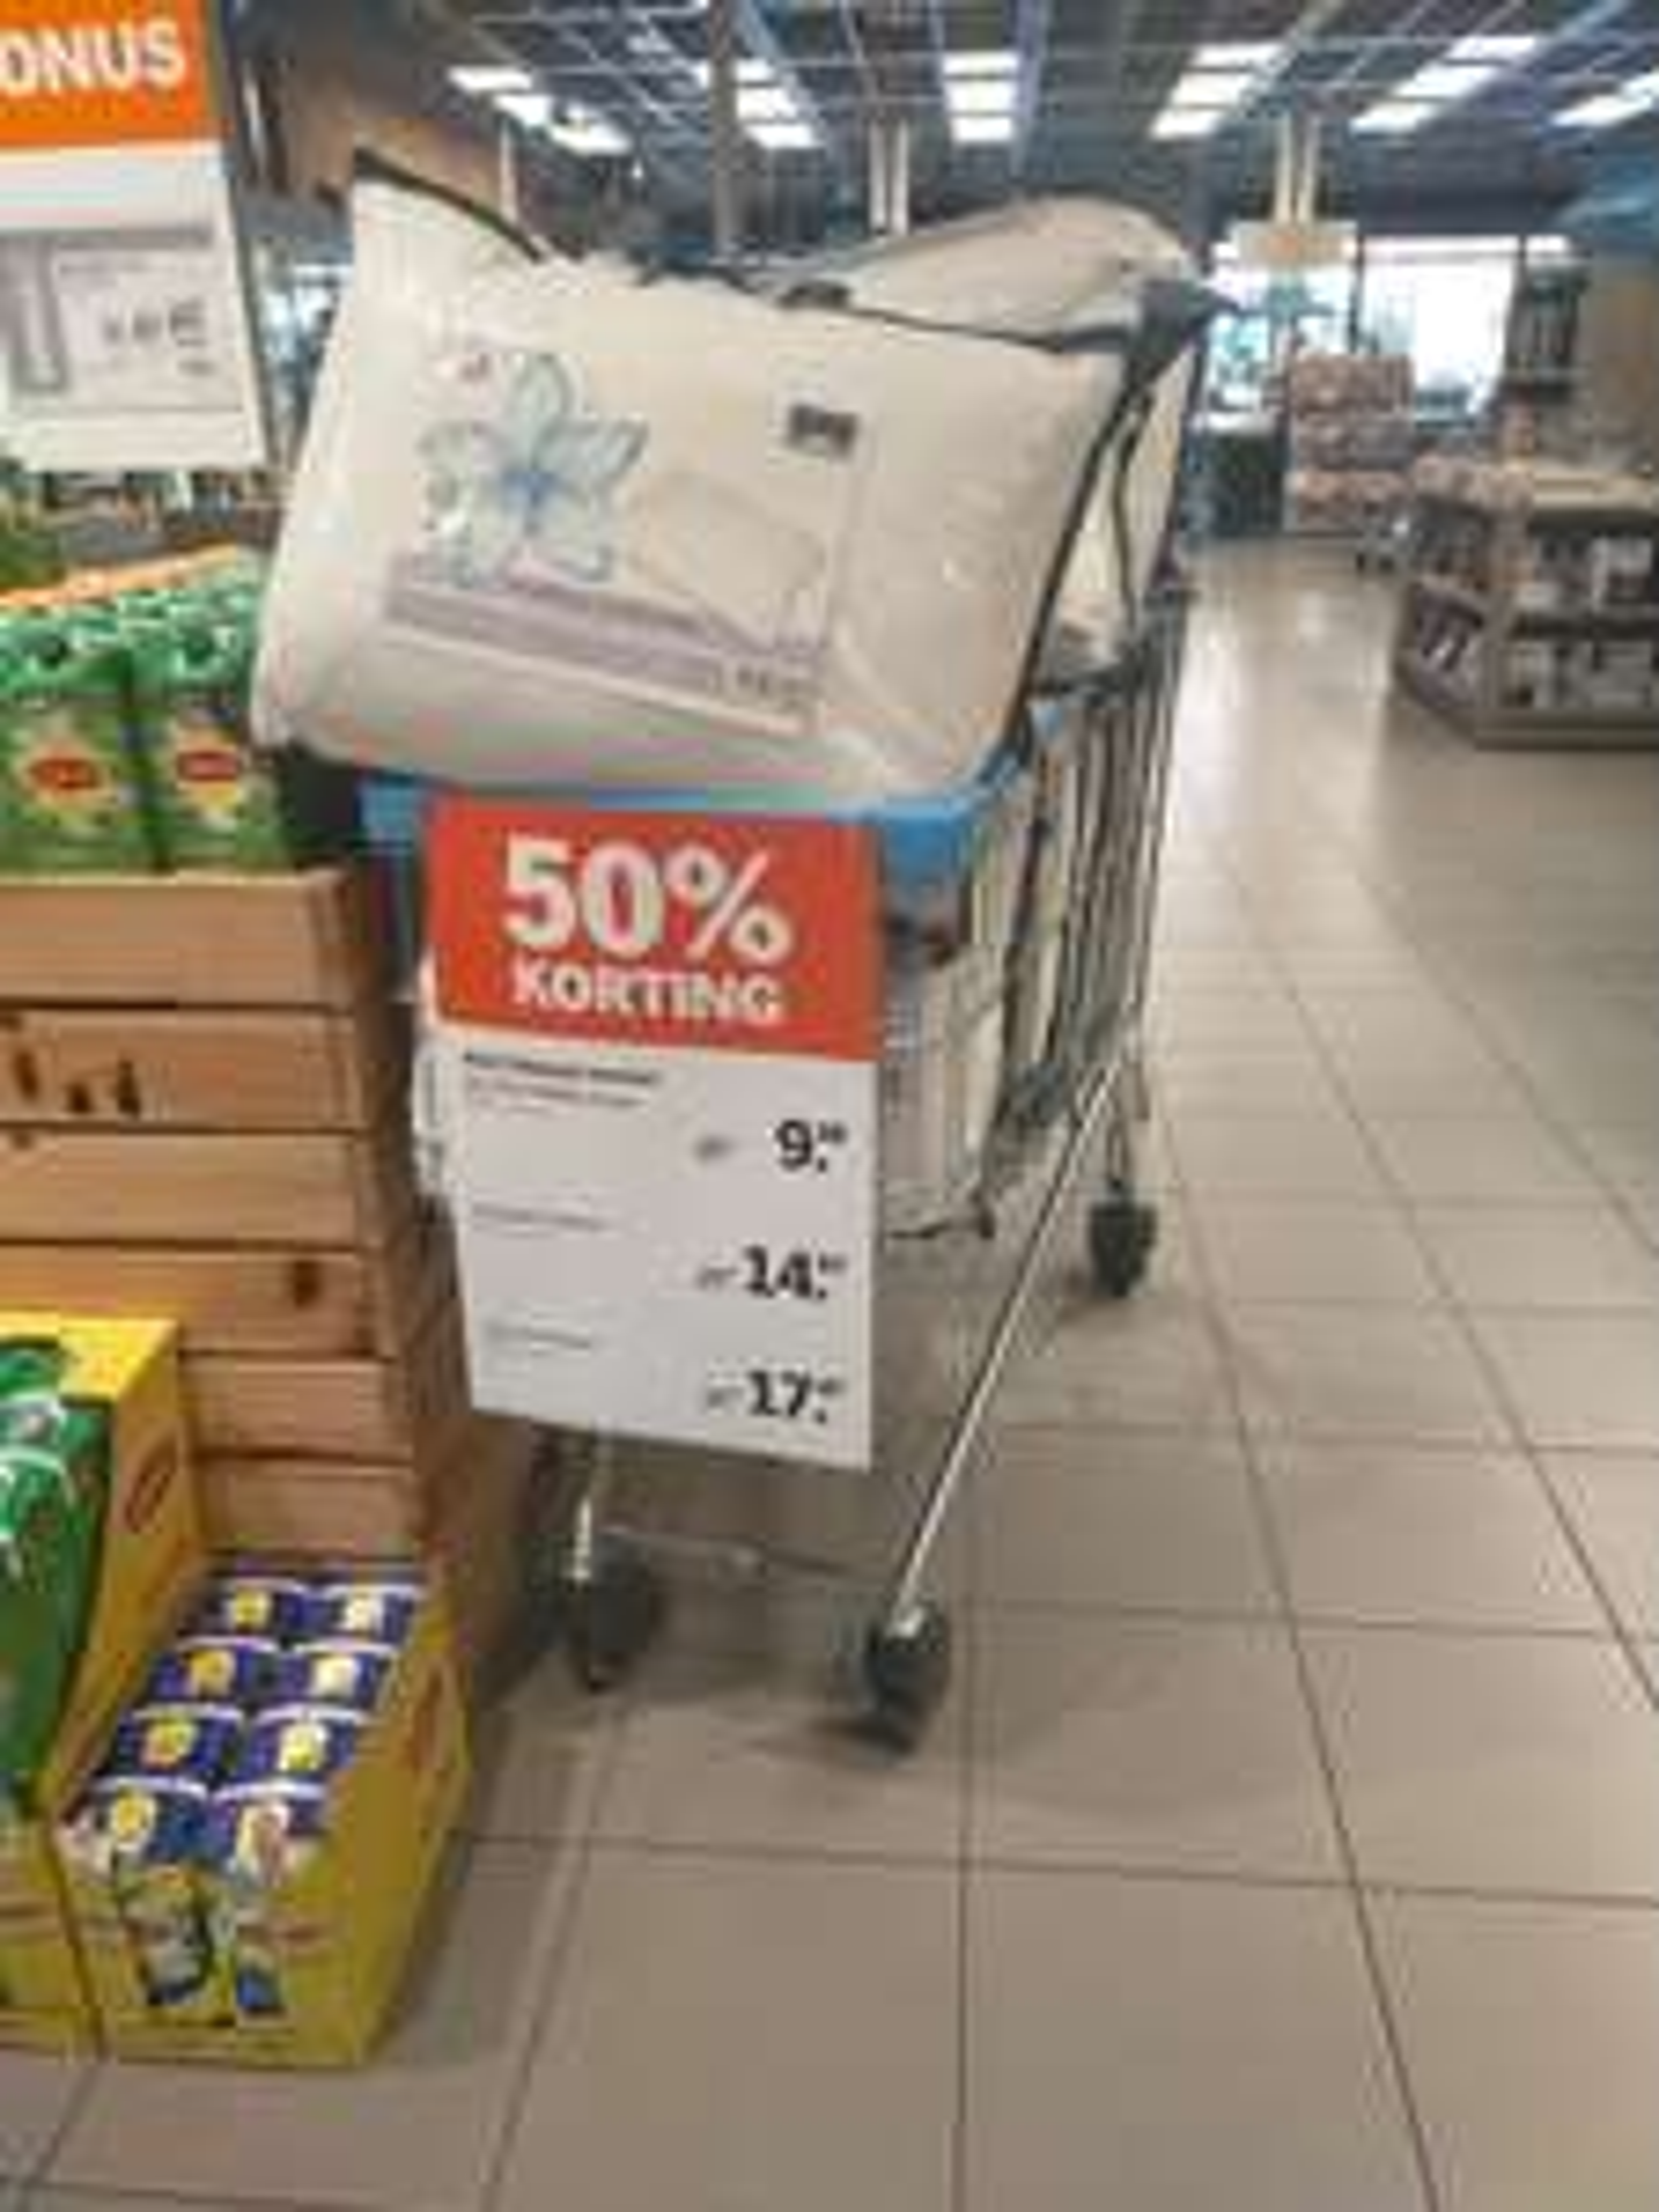 [lokaal] 50% korting op kussens @ Albert Heijn @ Ede Parkweide